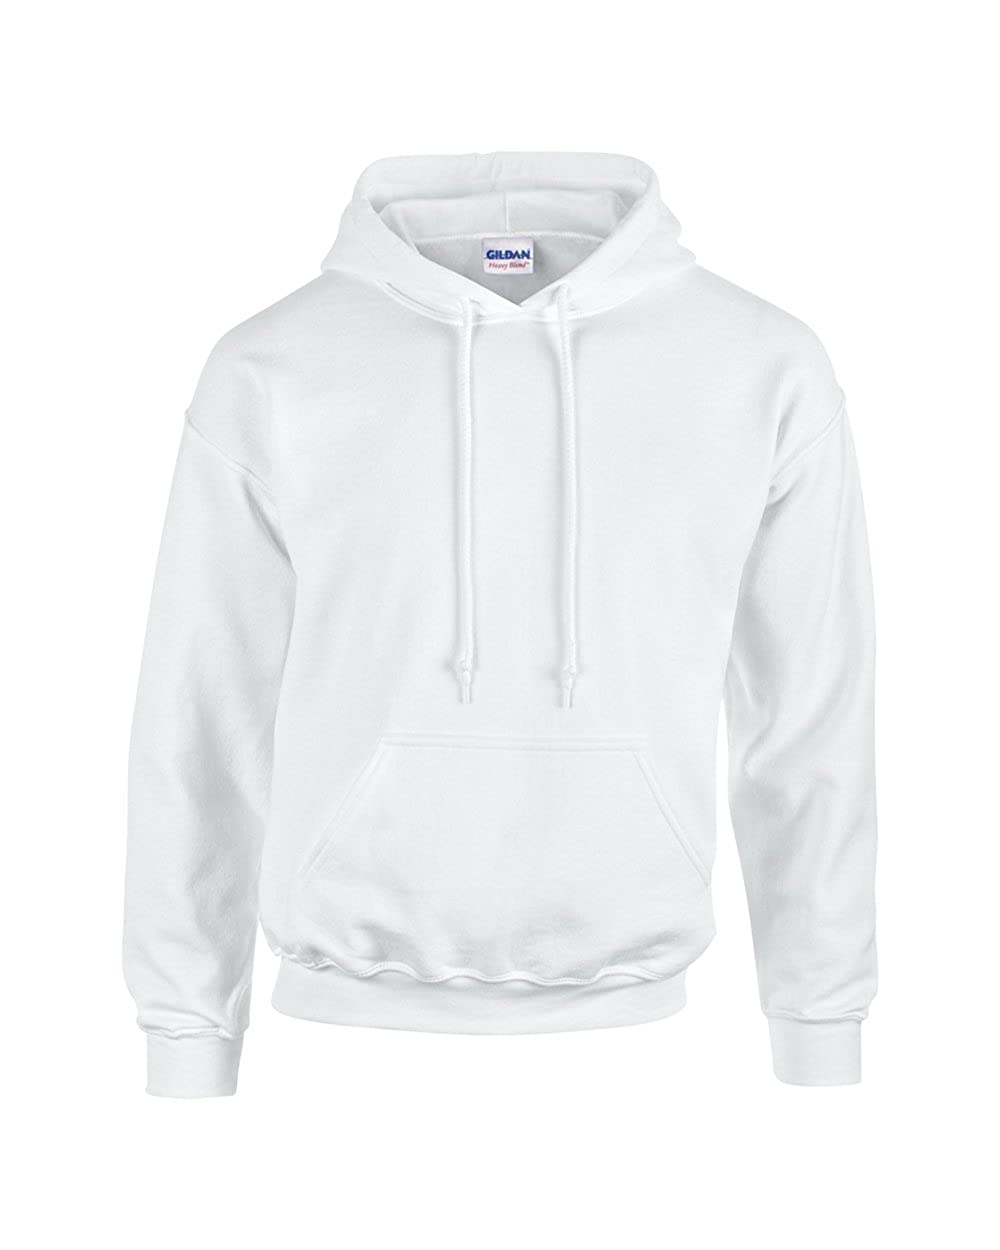 Gildan Heavyweight Blend Youth Hooded SweatShirt White S